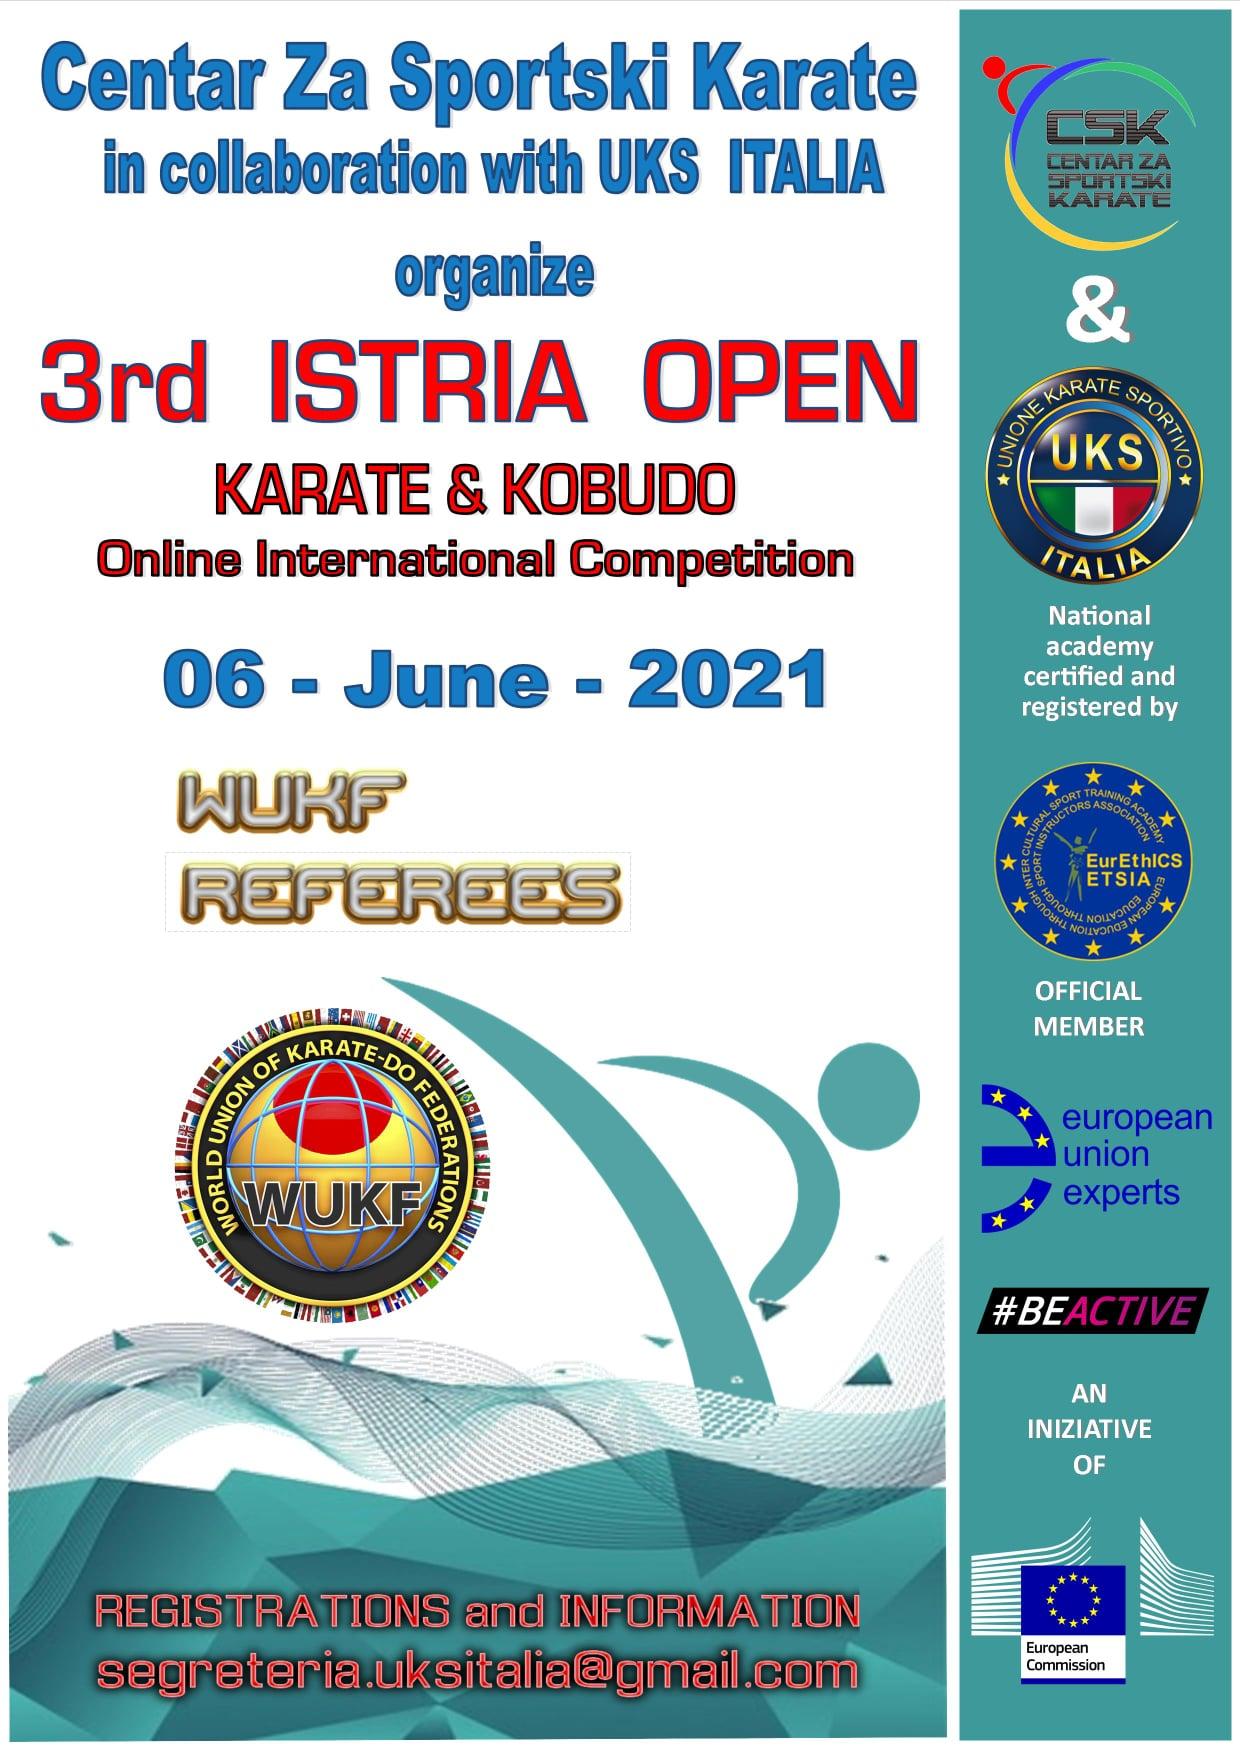 https://karate-slovakia.sk/wp-content/uploads/182653041_4477689202258320_6359824661567182570_n.jpg